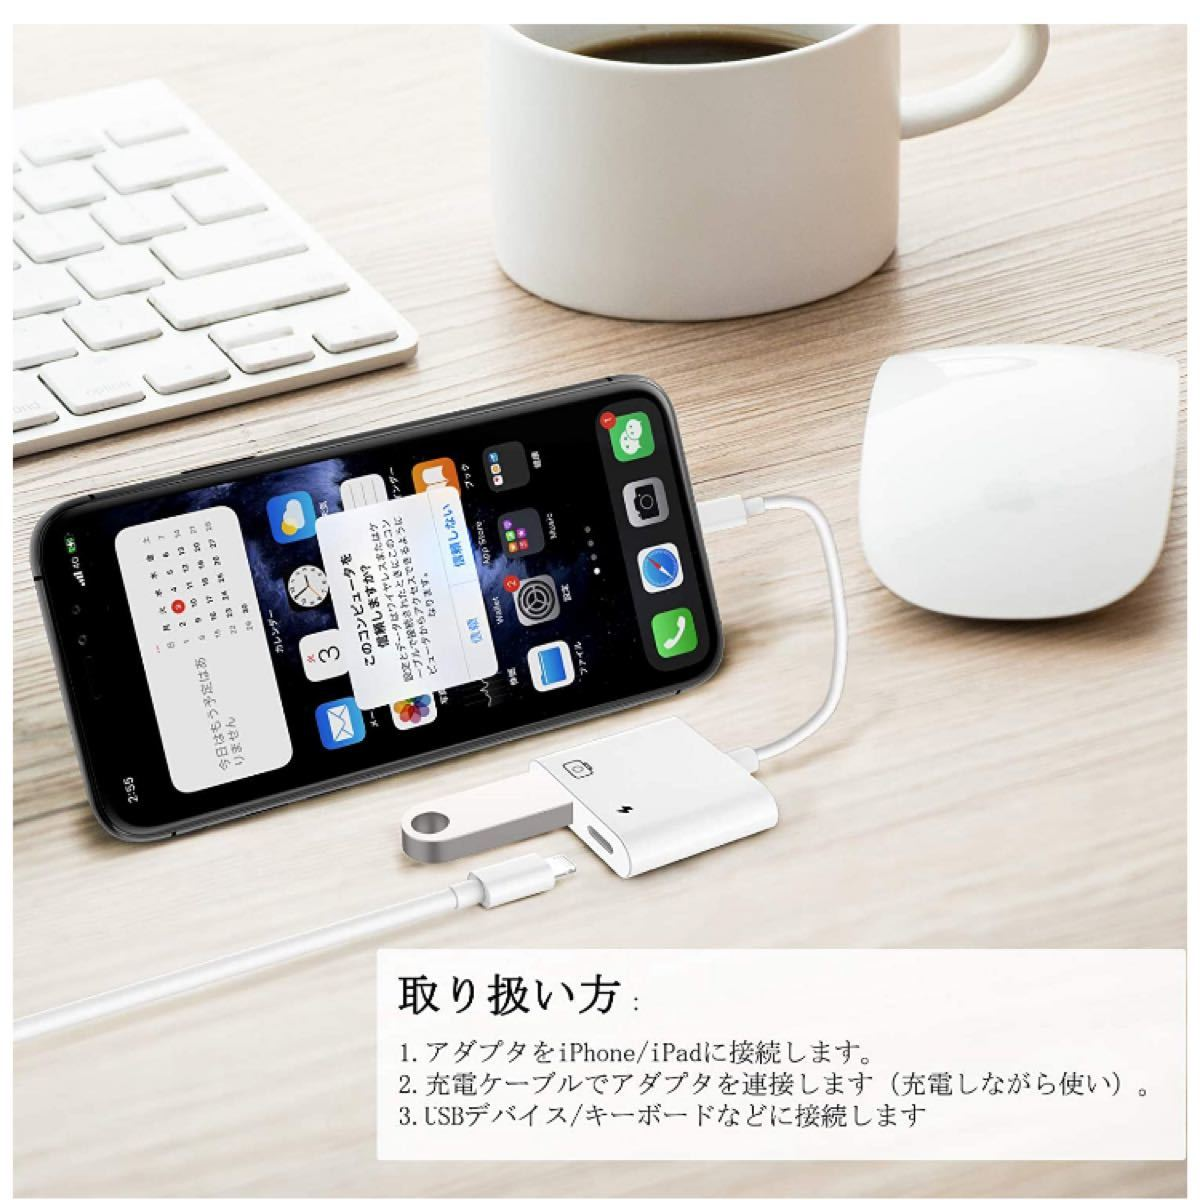 iPhone USB 変換 アダプタ Lightning USB 変換 ケーブル